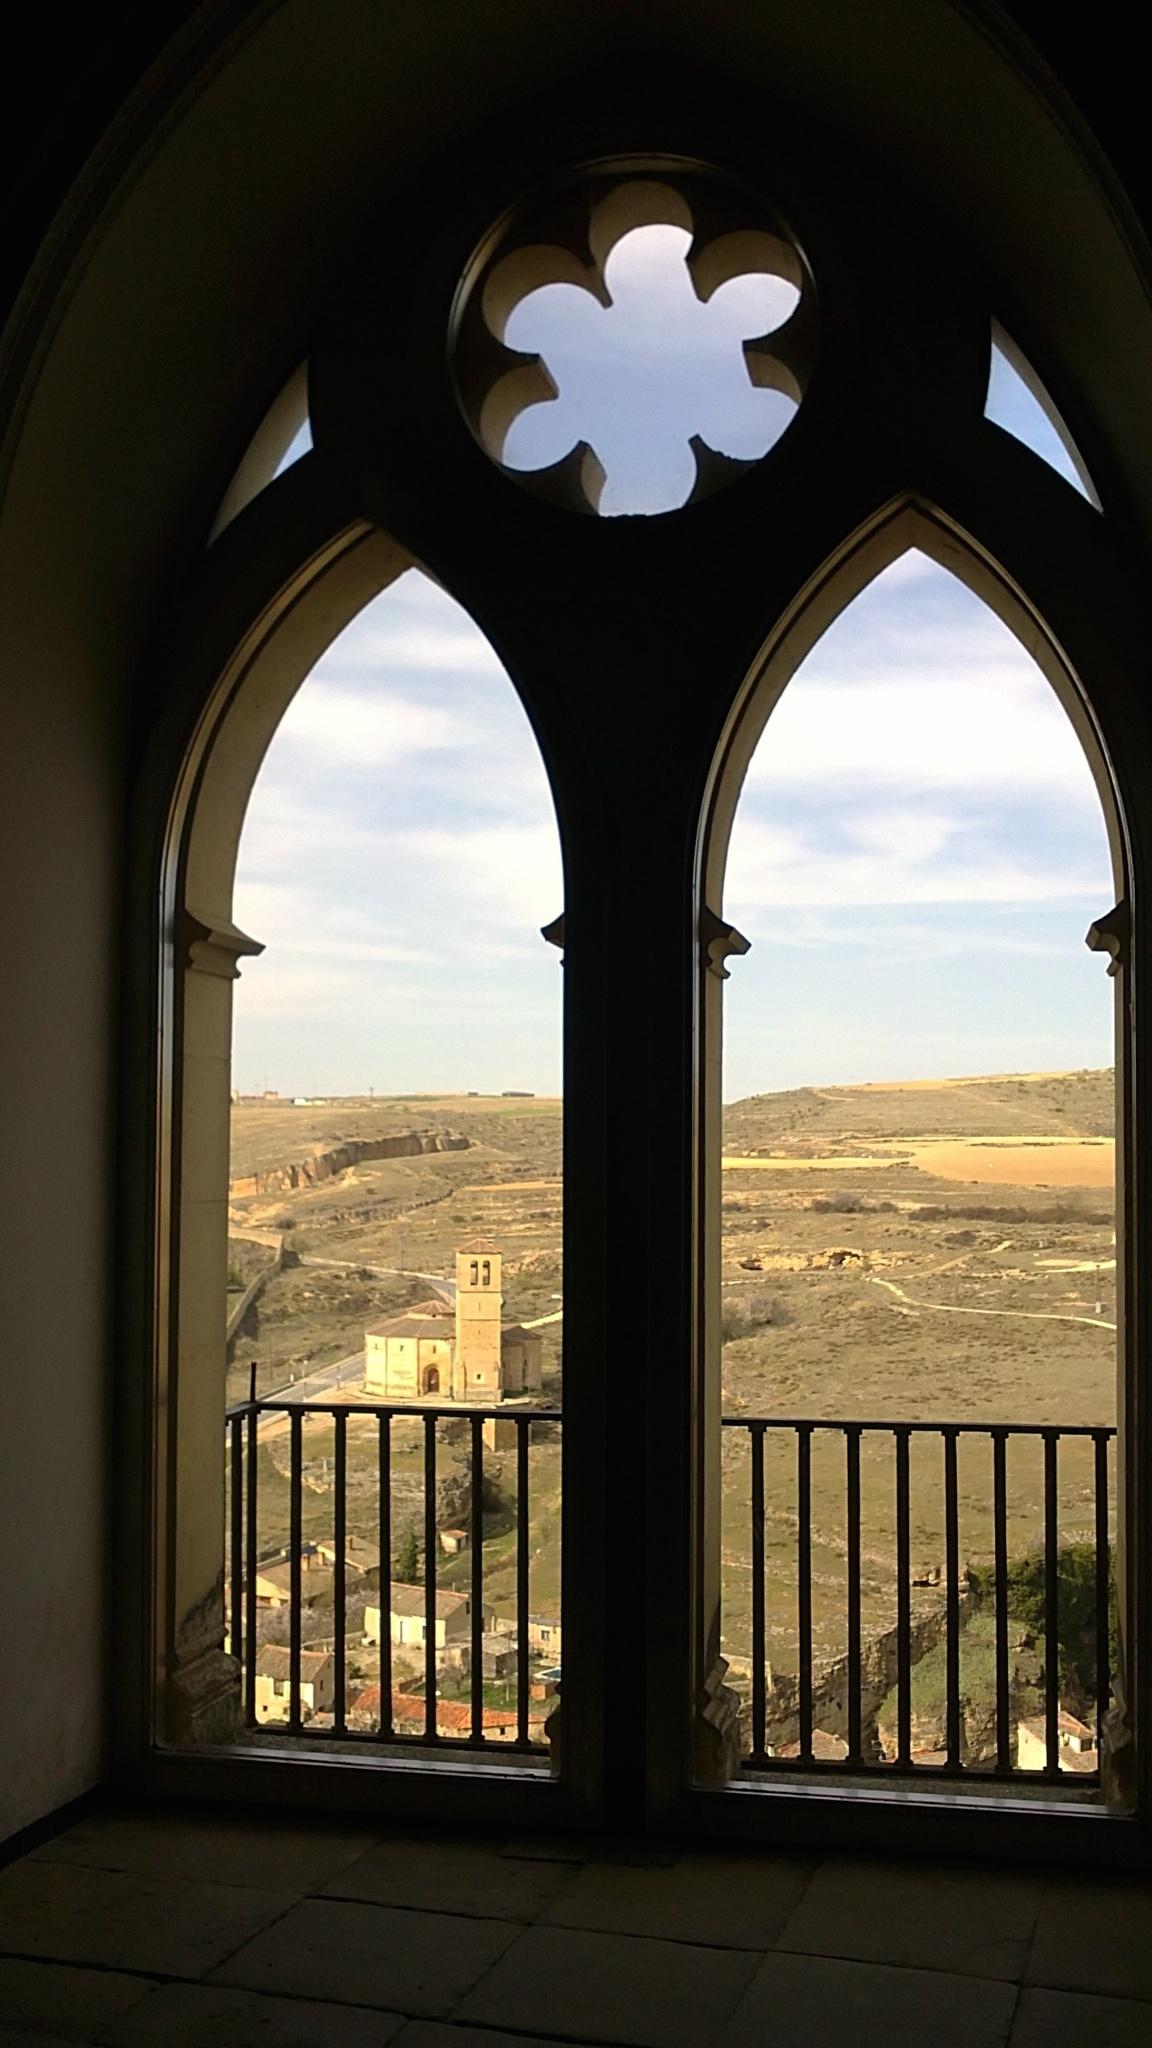 Look through the Alcazar of Segovia by Omar H Mahgoub